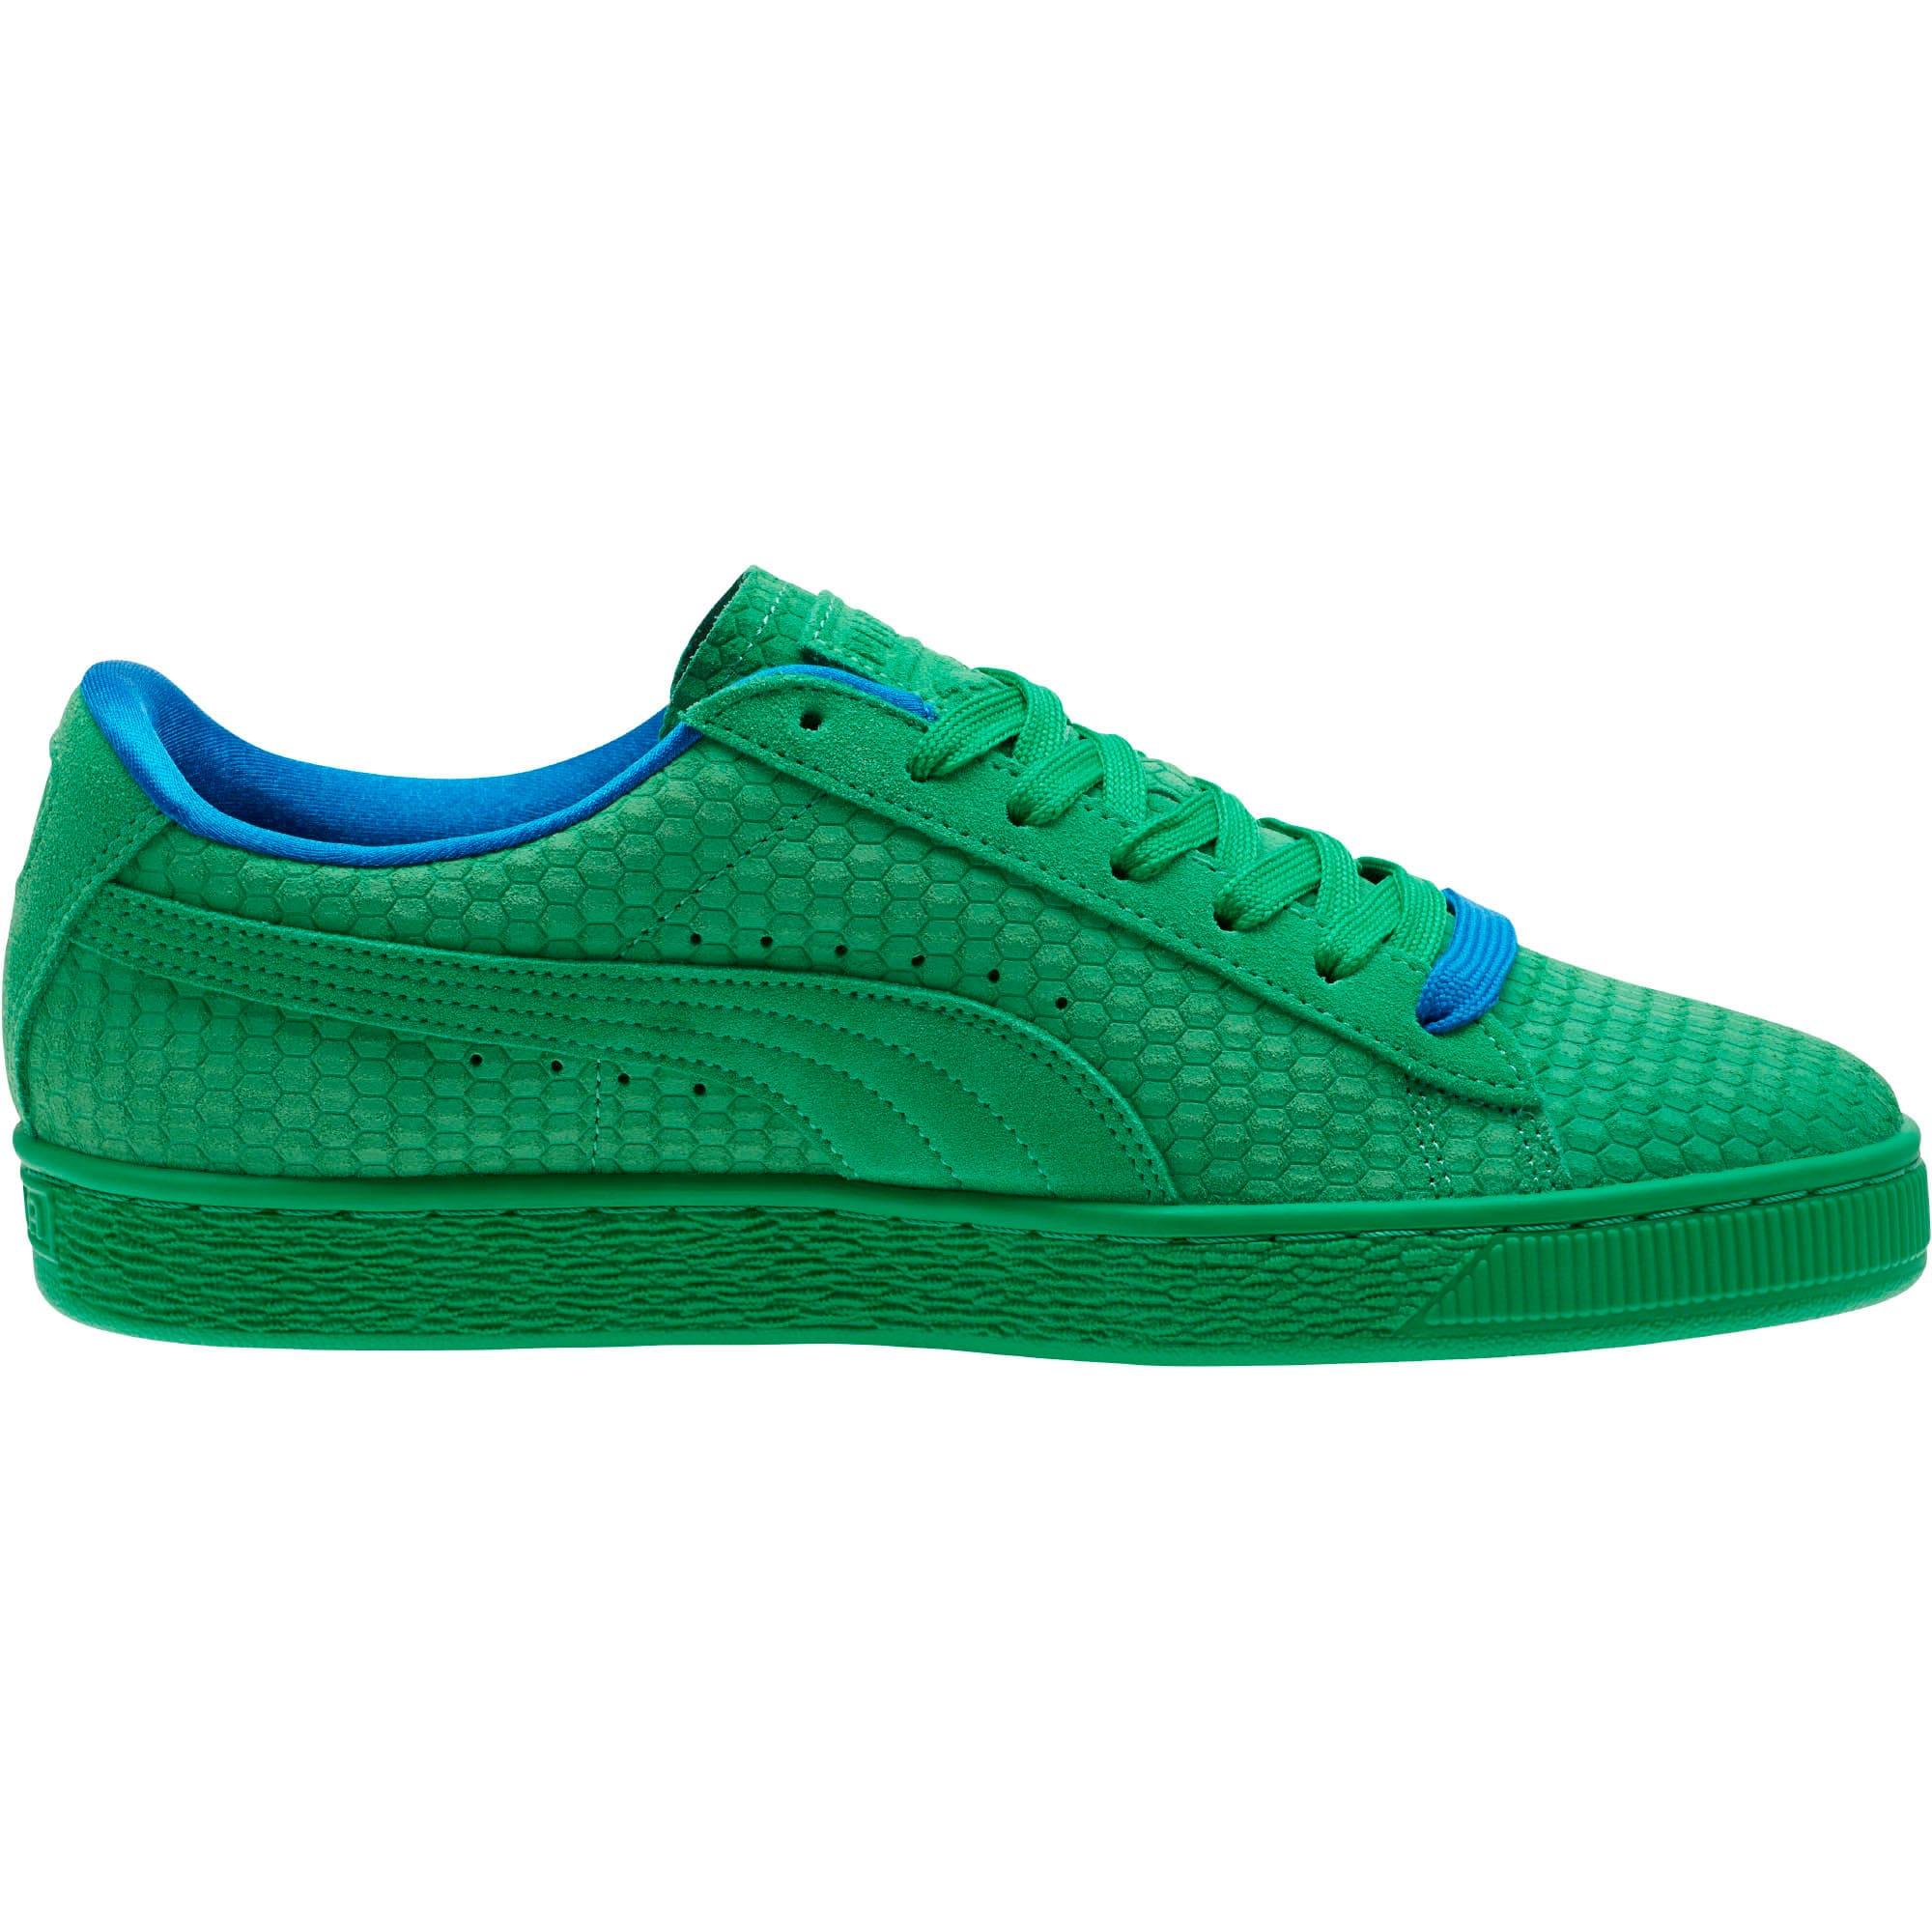 huge discount 43e4e 8c7a2 Suede Classic Archive AOP Sneakers